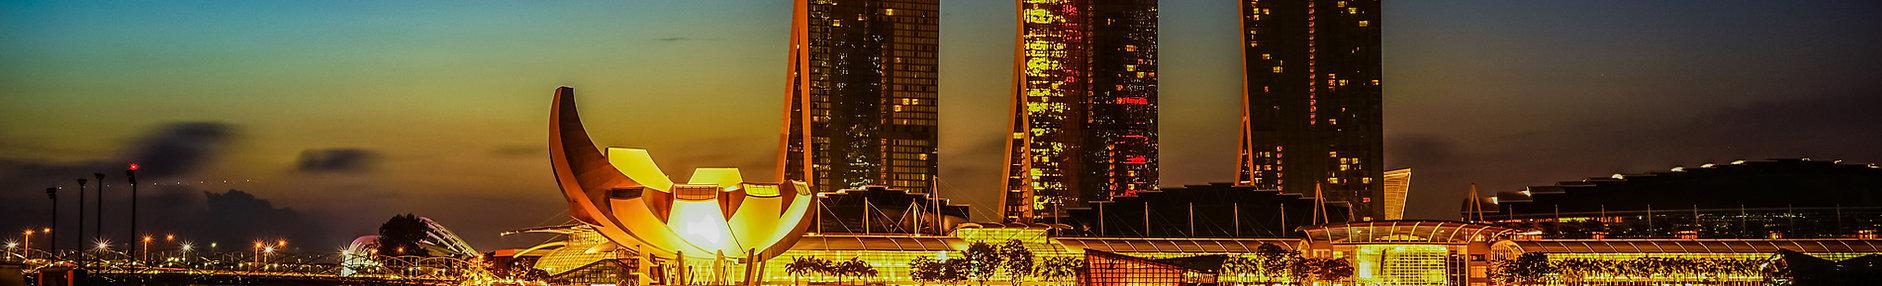 Singapore Backdrop views.jpg